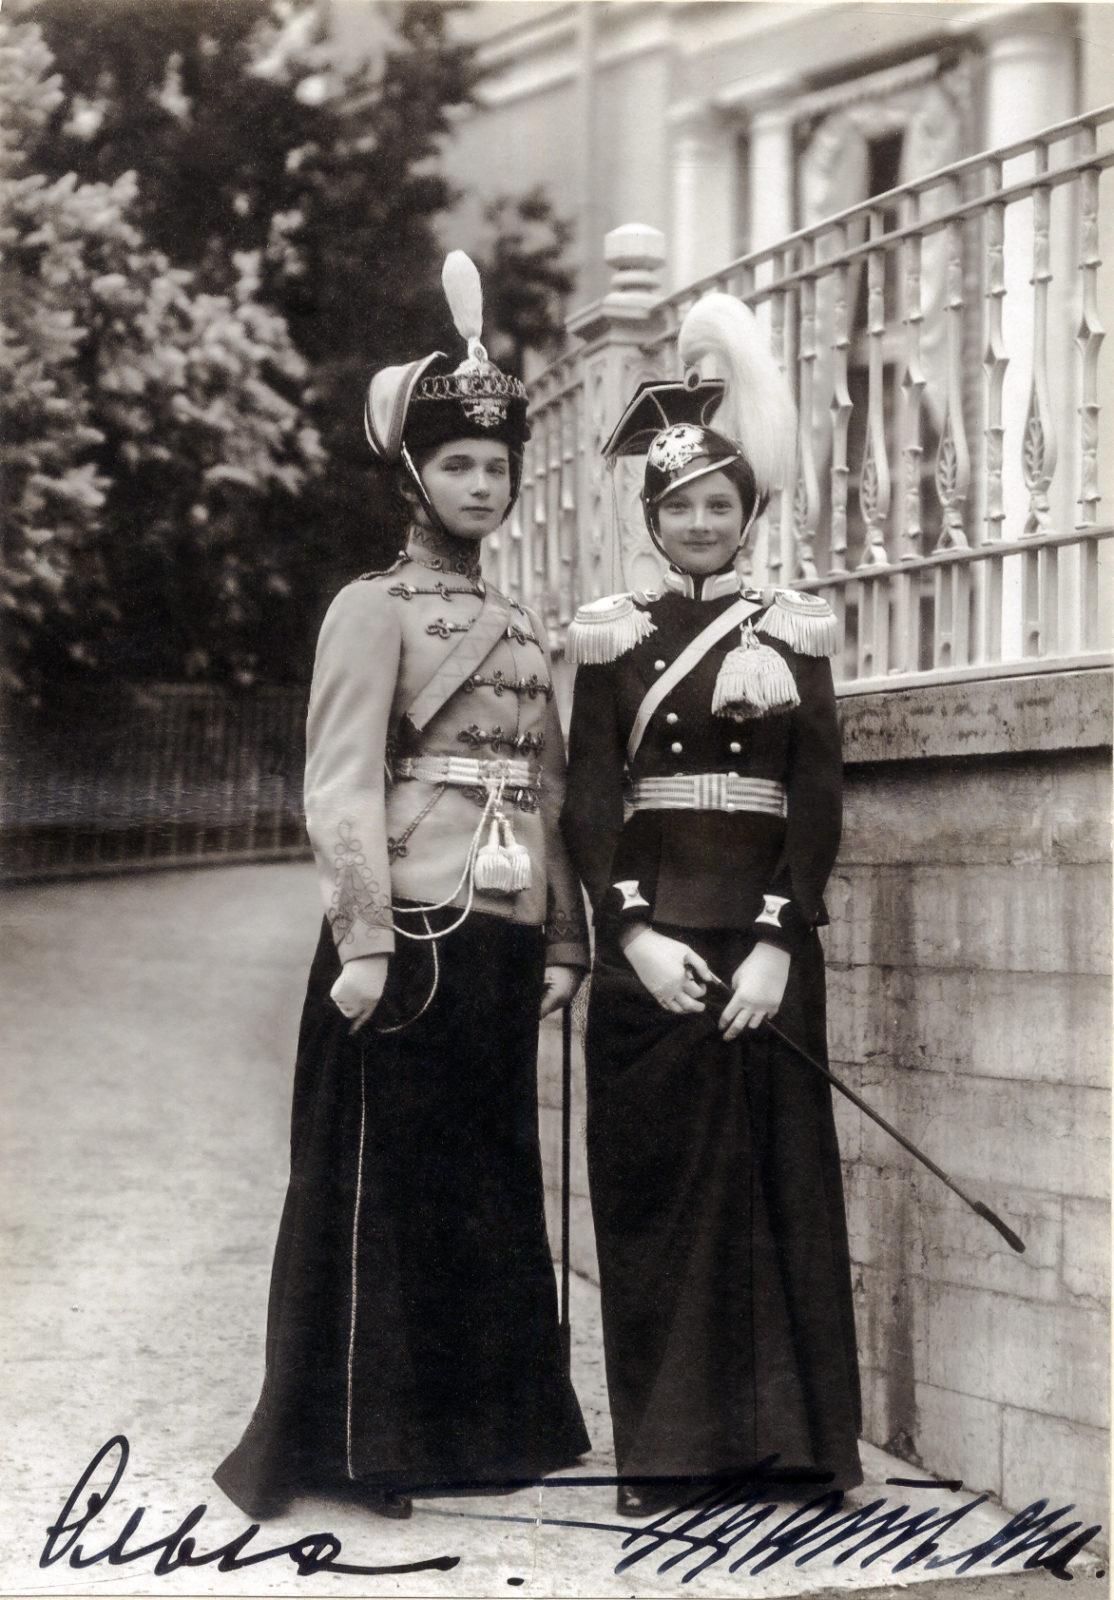 Grand Duchesses Tatiana, in the 8th Voznesensky Regiment uniform, and Olga in 3rd Hussar Elisavetgrad Regiment military uniform. 1911.